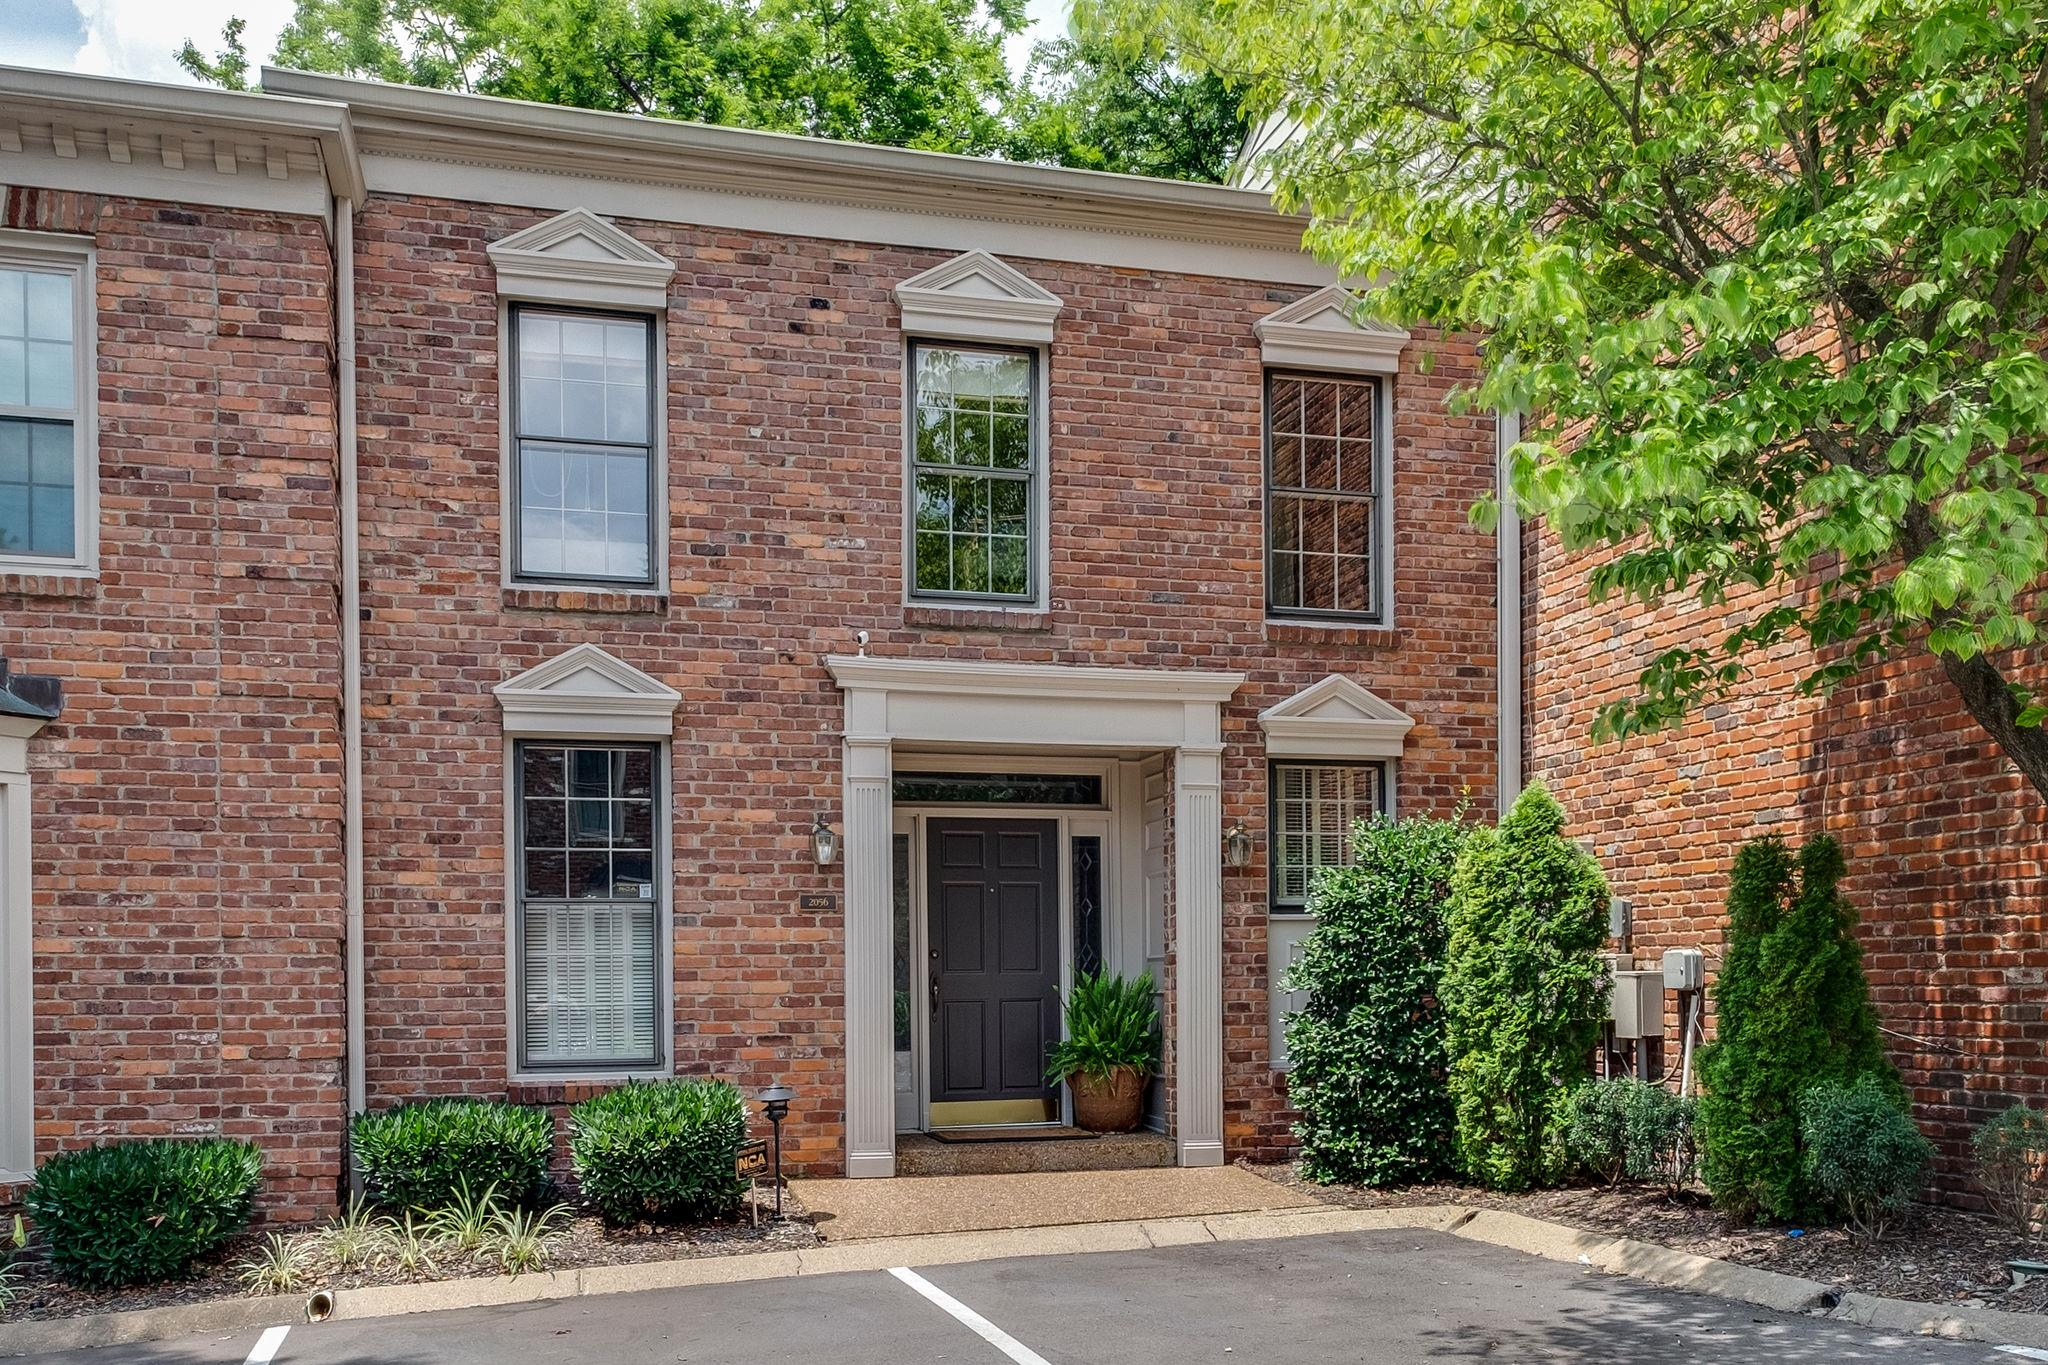 2056 Graybar Ln, Nashville, TN 37215 - Nashville, TN real estate listing